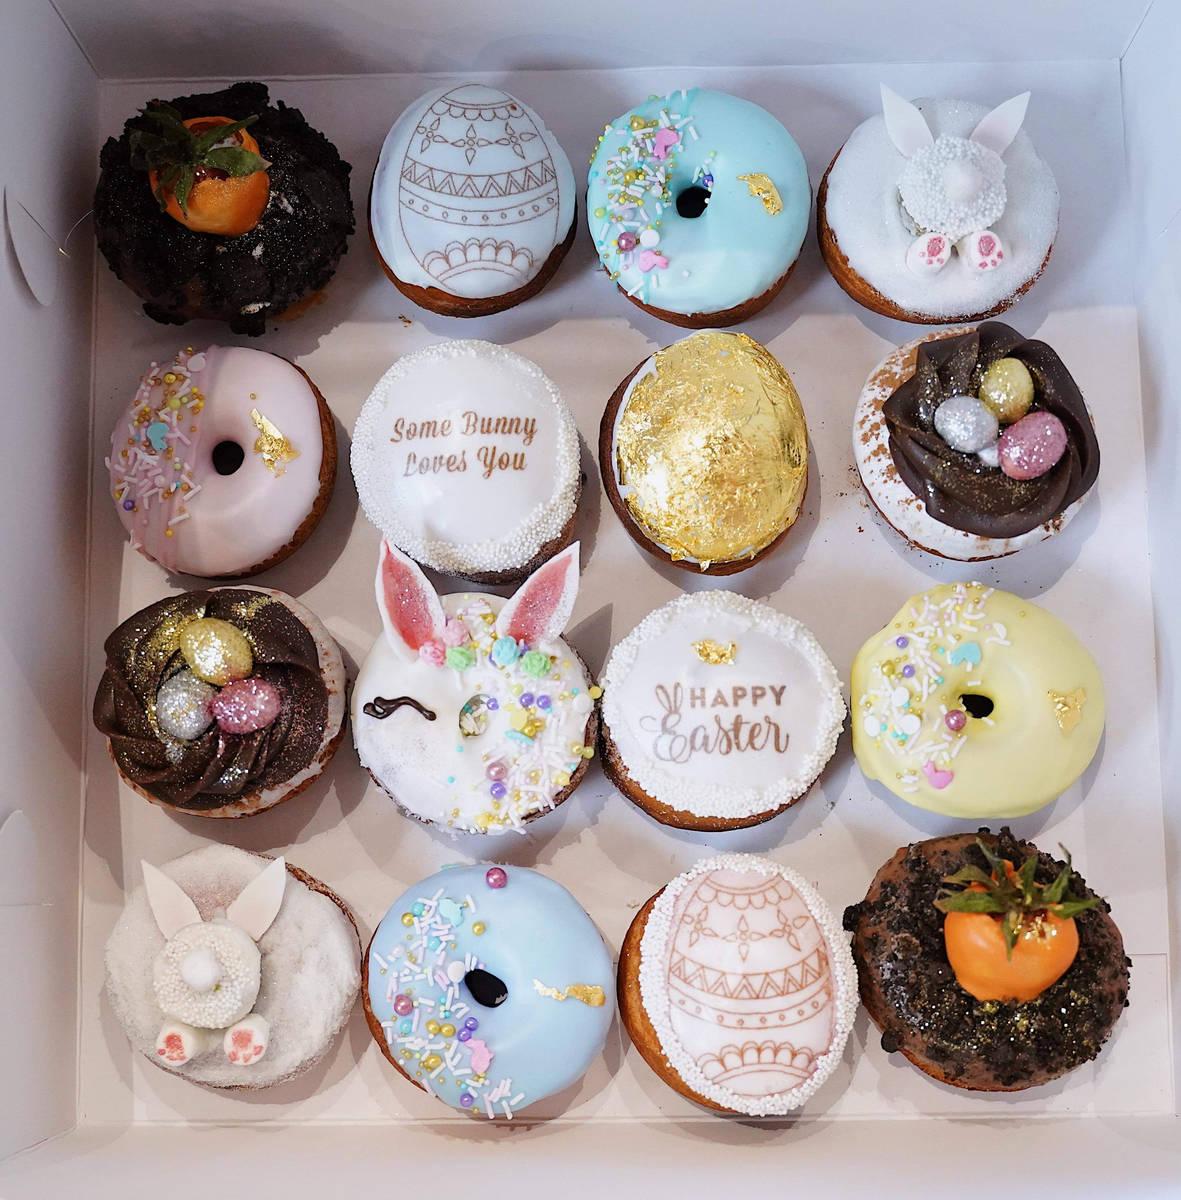 Easter-themed doughnuts at Saint Honore. (Saint Honore Doughnuts & Beignets)